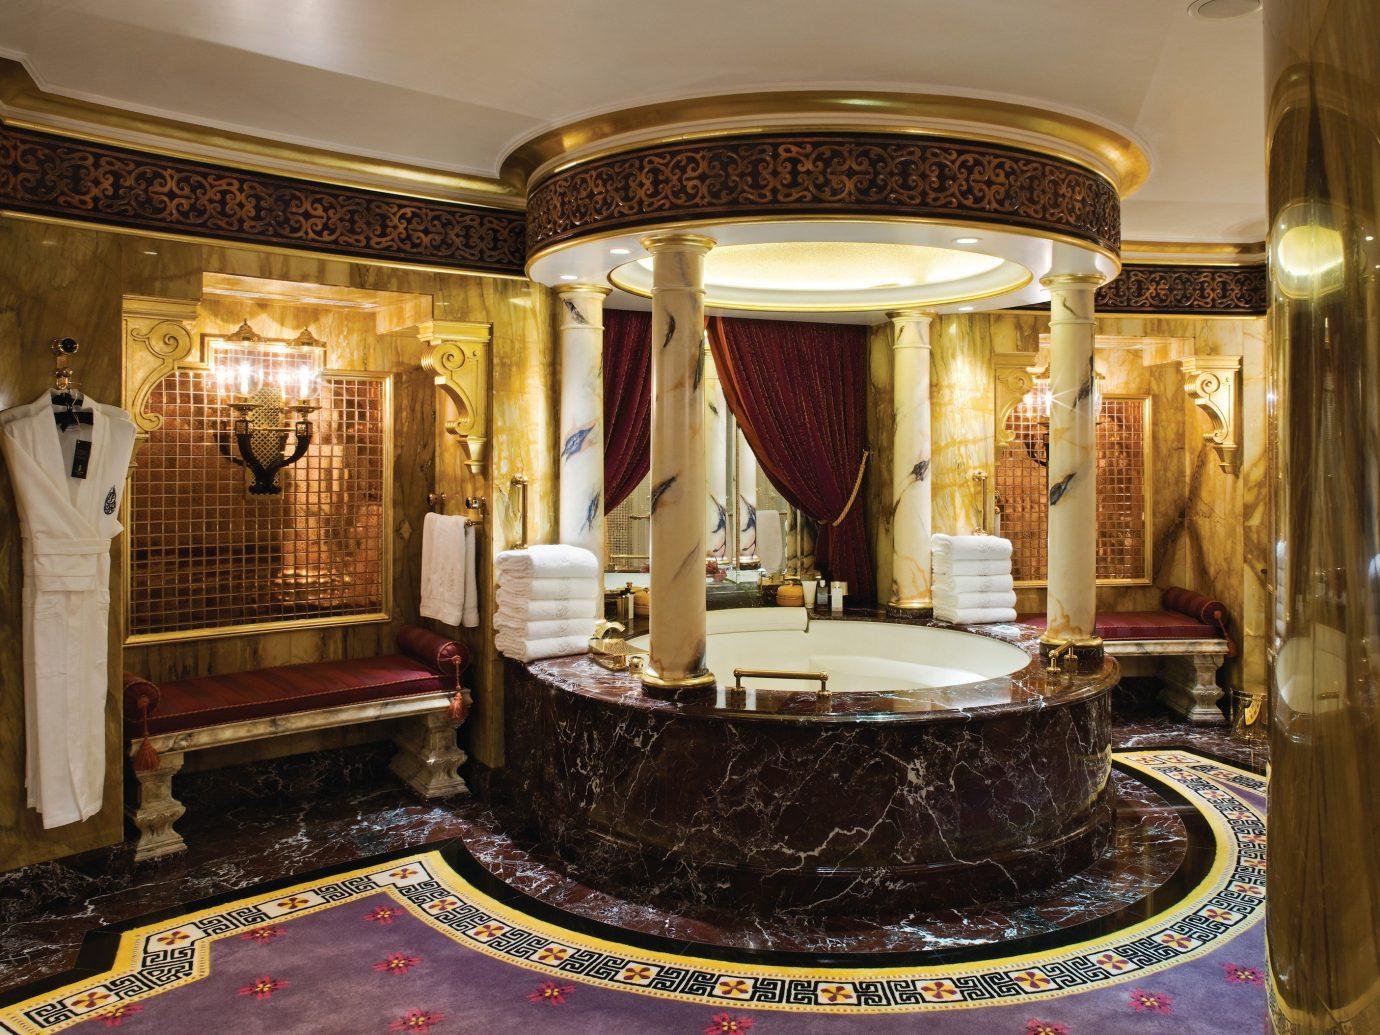 Hotels indoor room Lobby estate interior design mansion stone